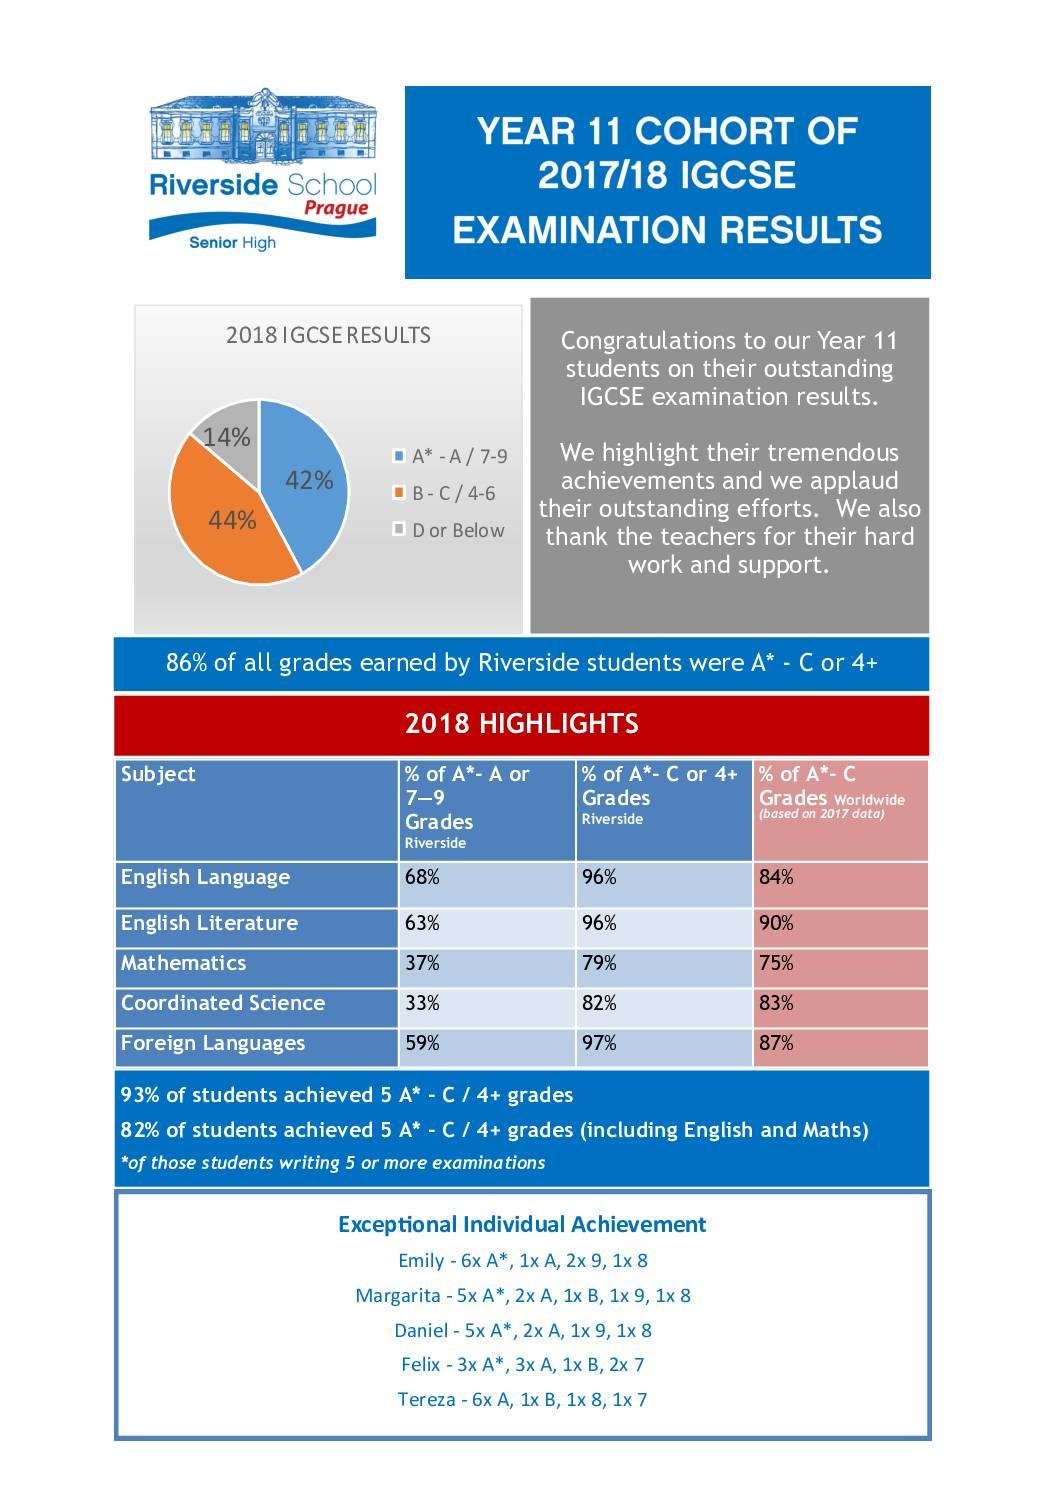 Examination Results - Riverside International School in Prague